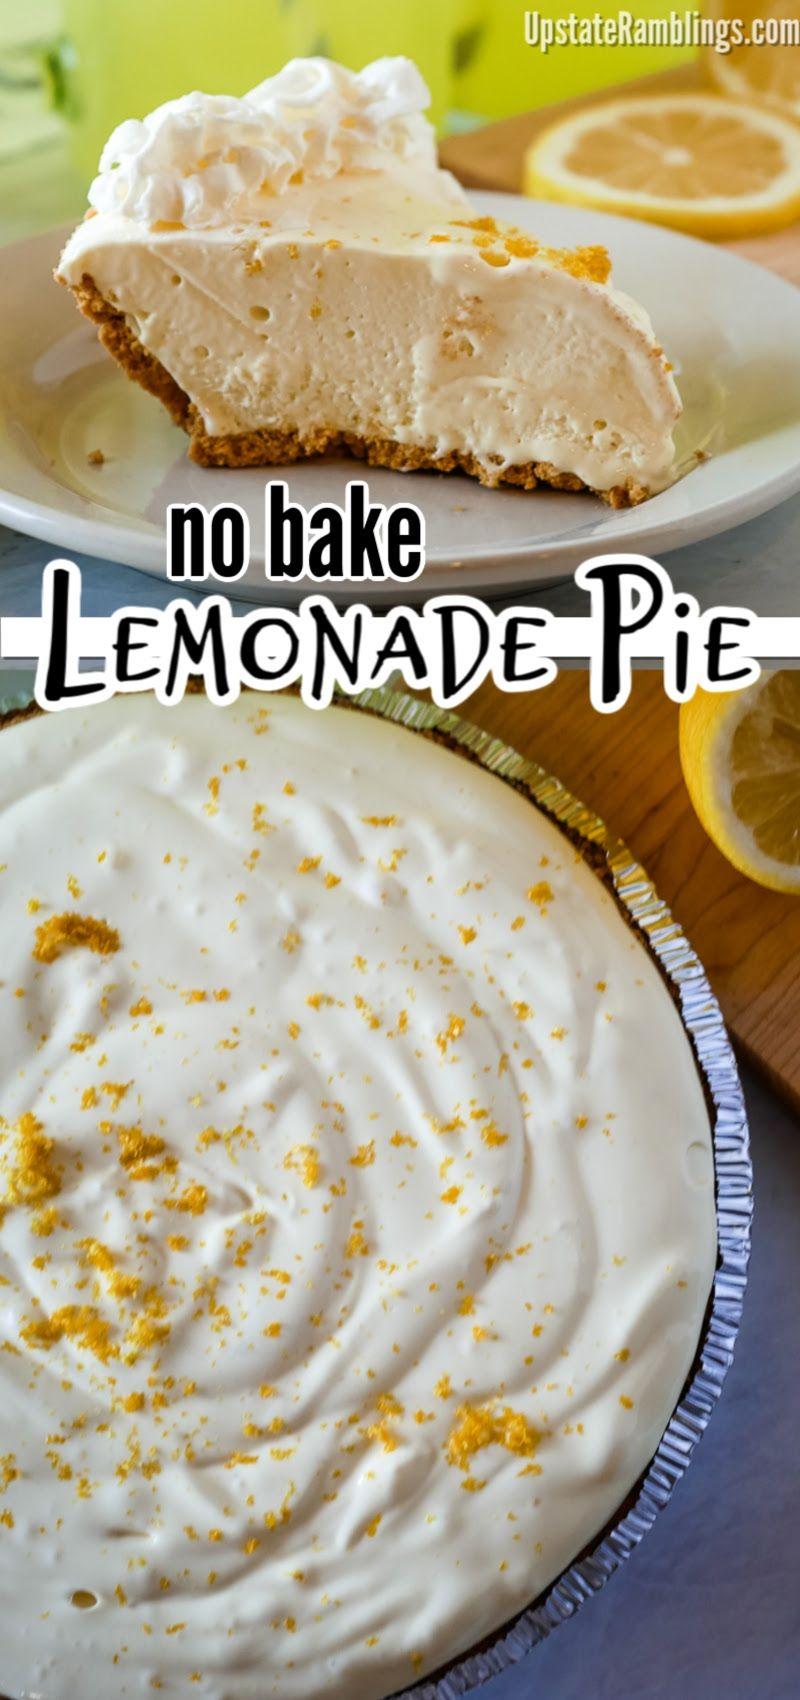 No Bake Lemonade Pie -   19 desserts Sweets simple ideas